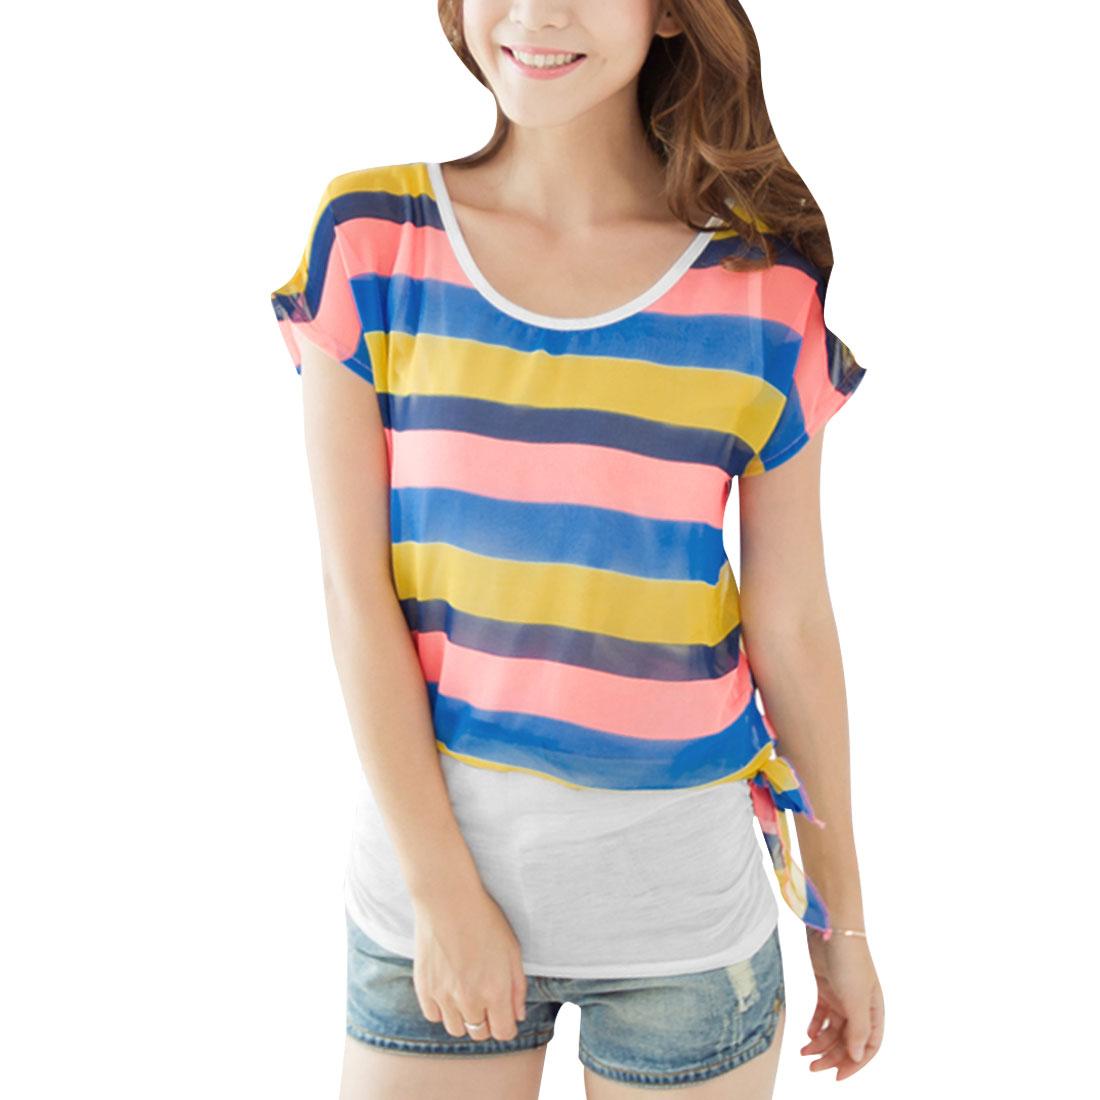 Lady Short Batwing Sleeve Stripes Pattern Yellow Salmon Pink Blouse XS